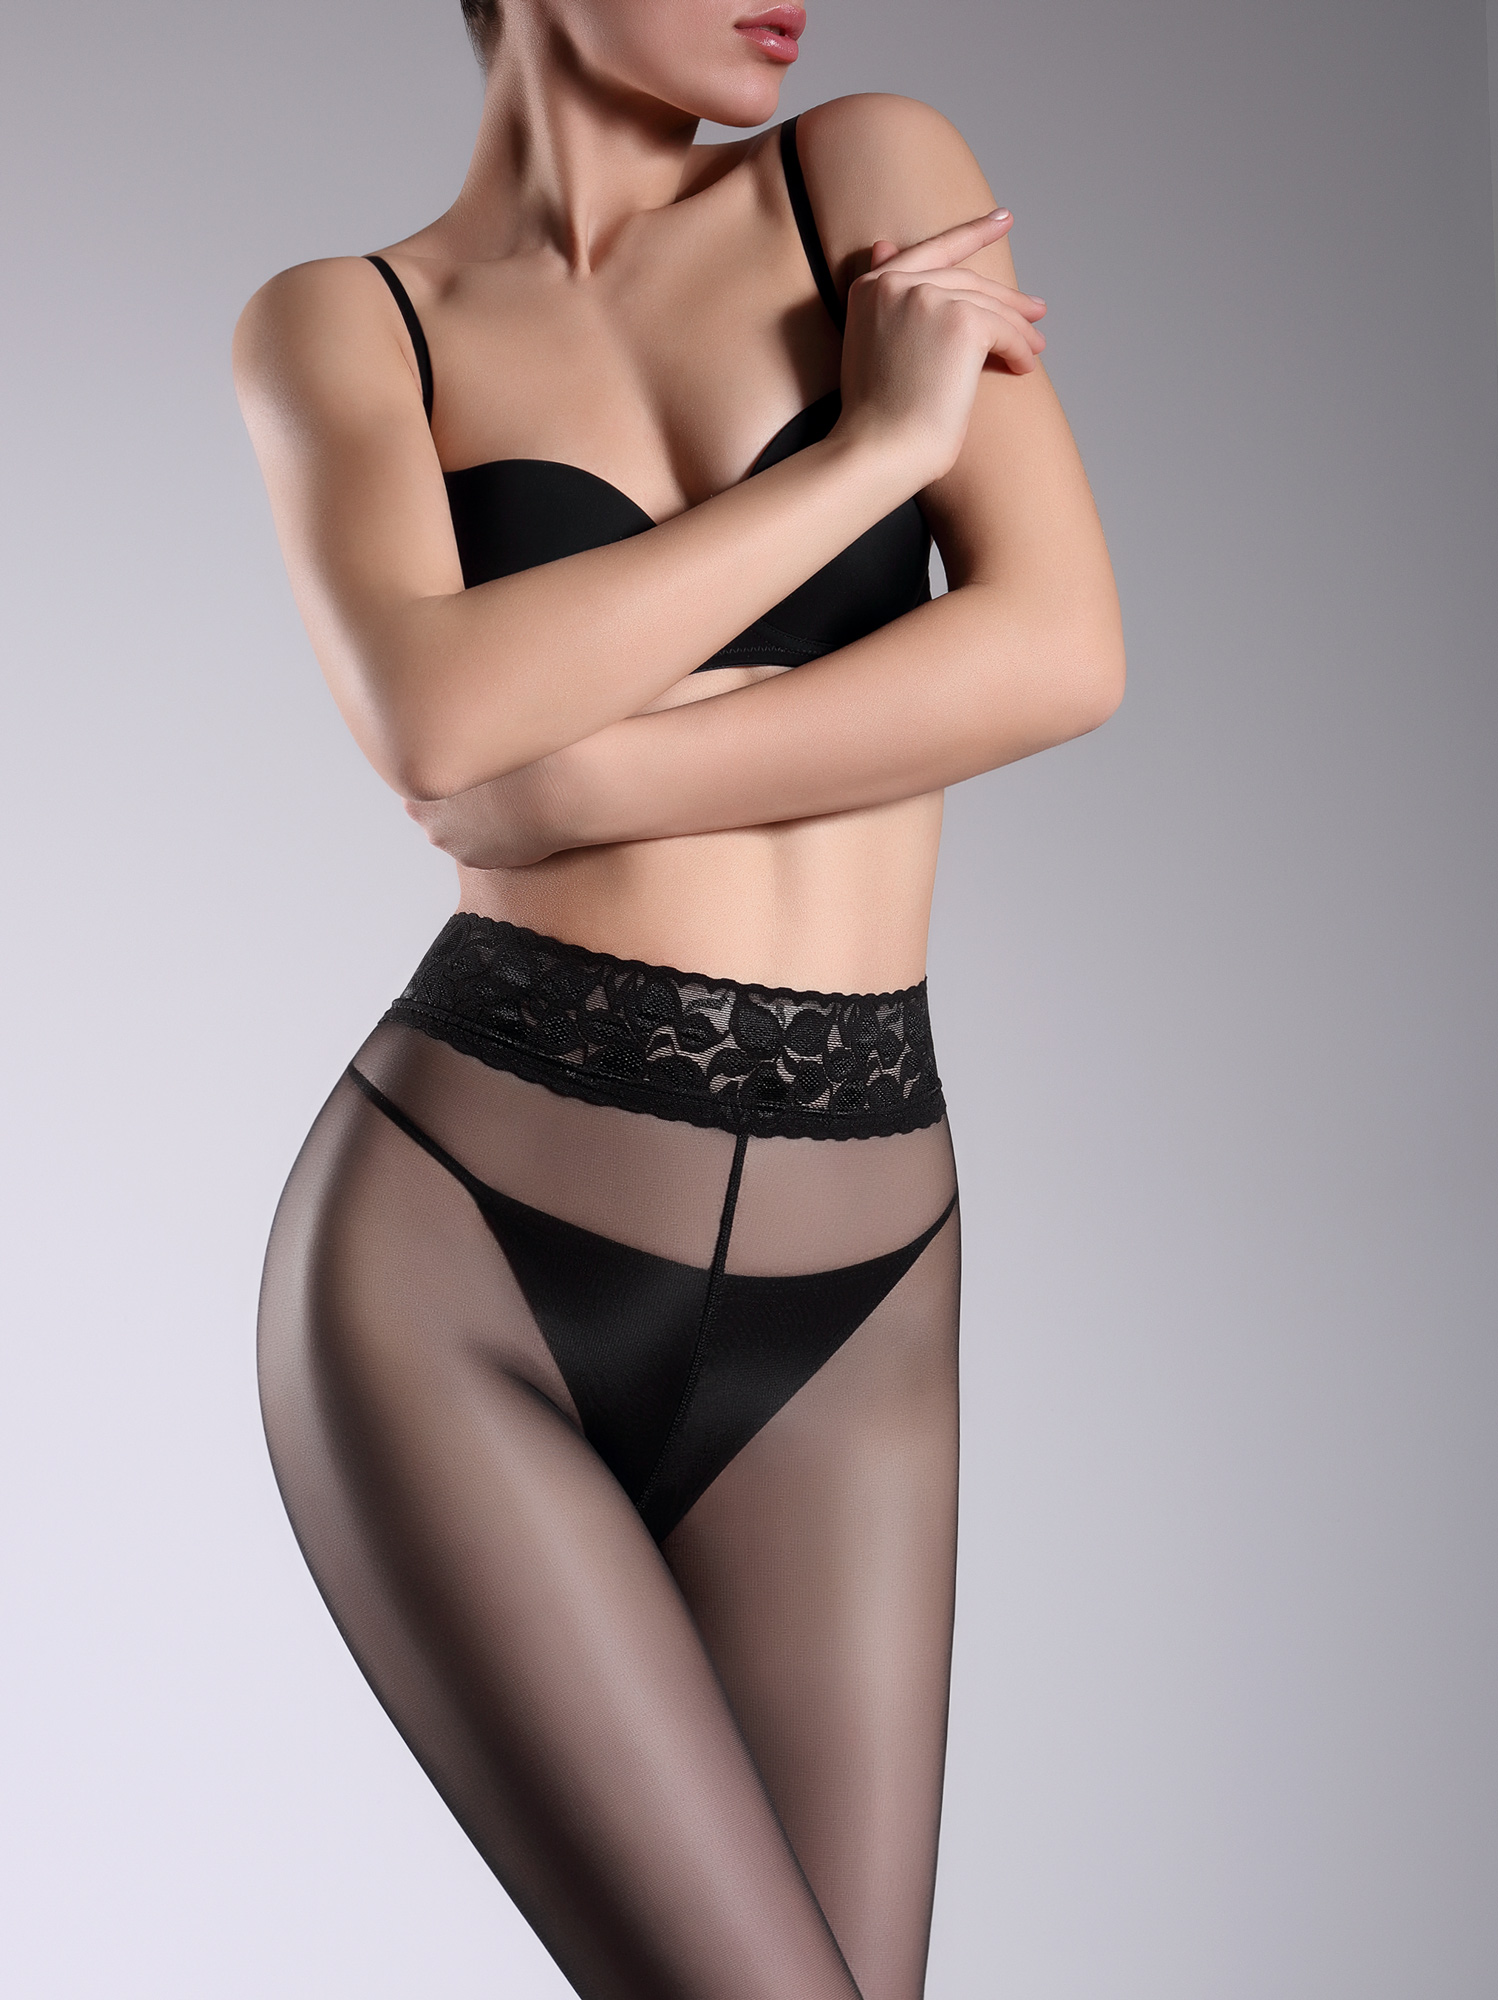 c849de3000b ... Voorvertoning: Giulia Impresso 20 - Gladde transparante panty met  kanten boord